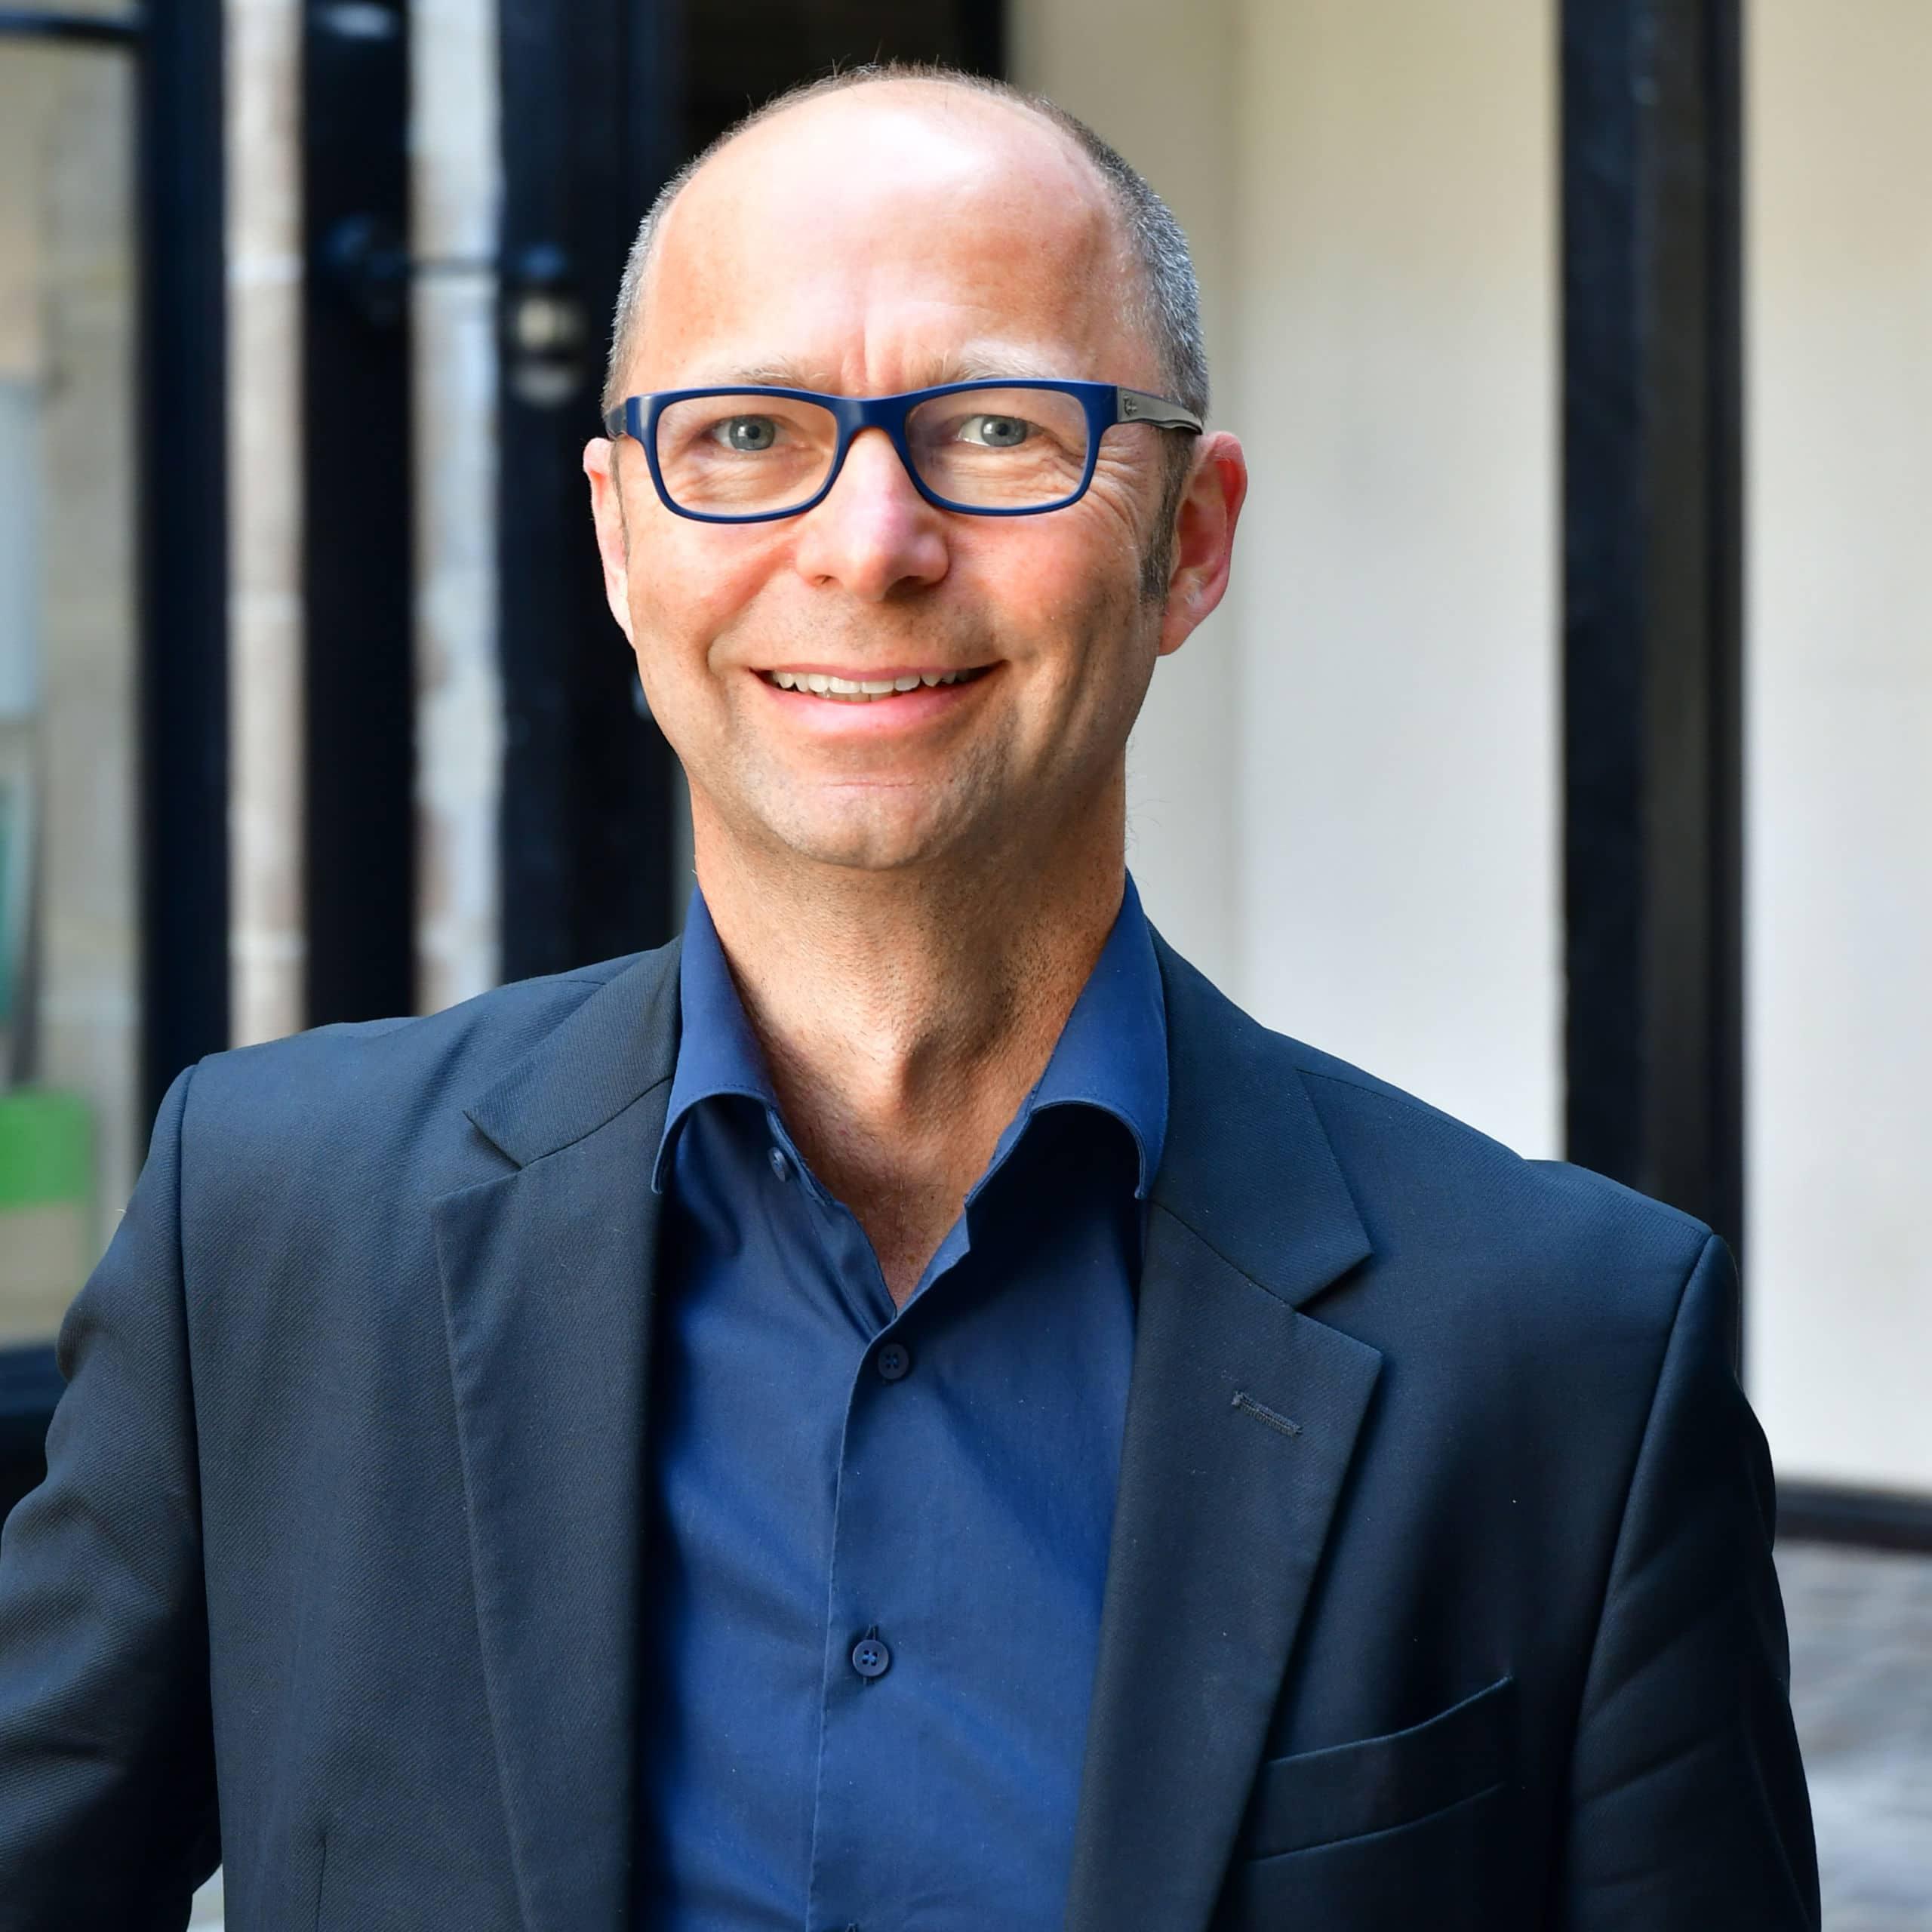 Ralf Hornig, PhD Director of Clinical Affairs